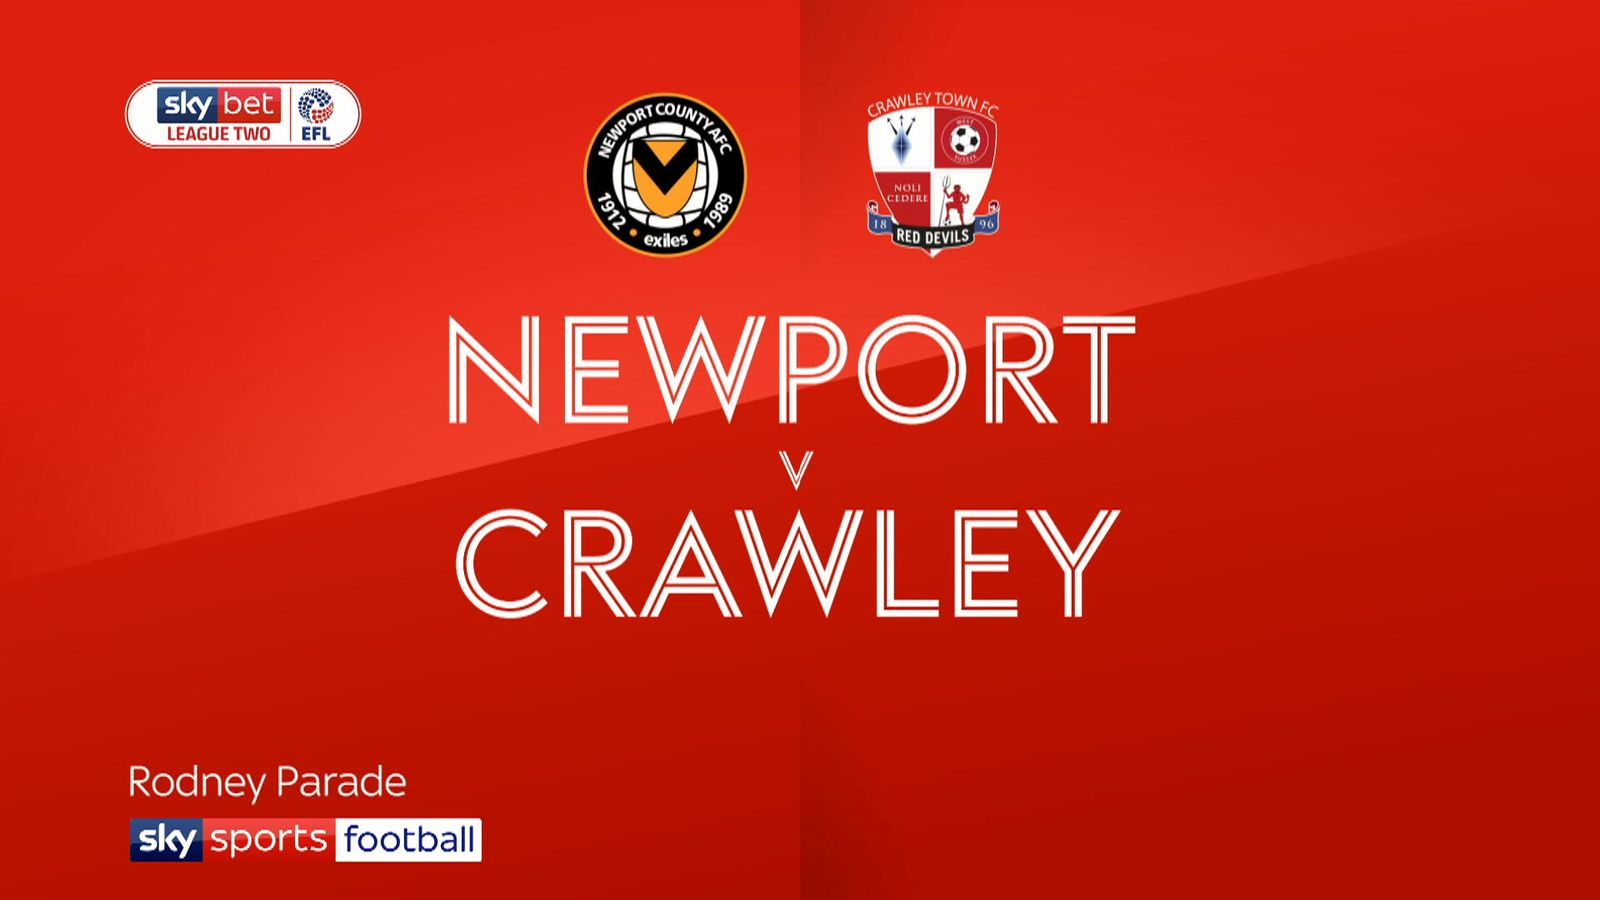 b98a1f04633 Newport 0 - 0 Crawley - Match Report & Highlights